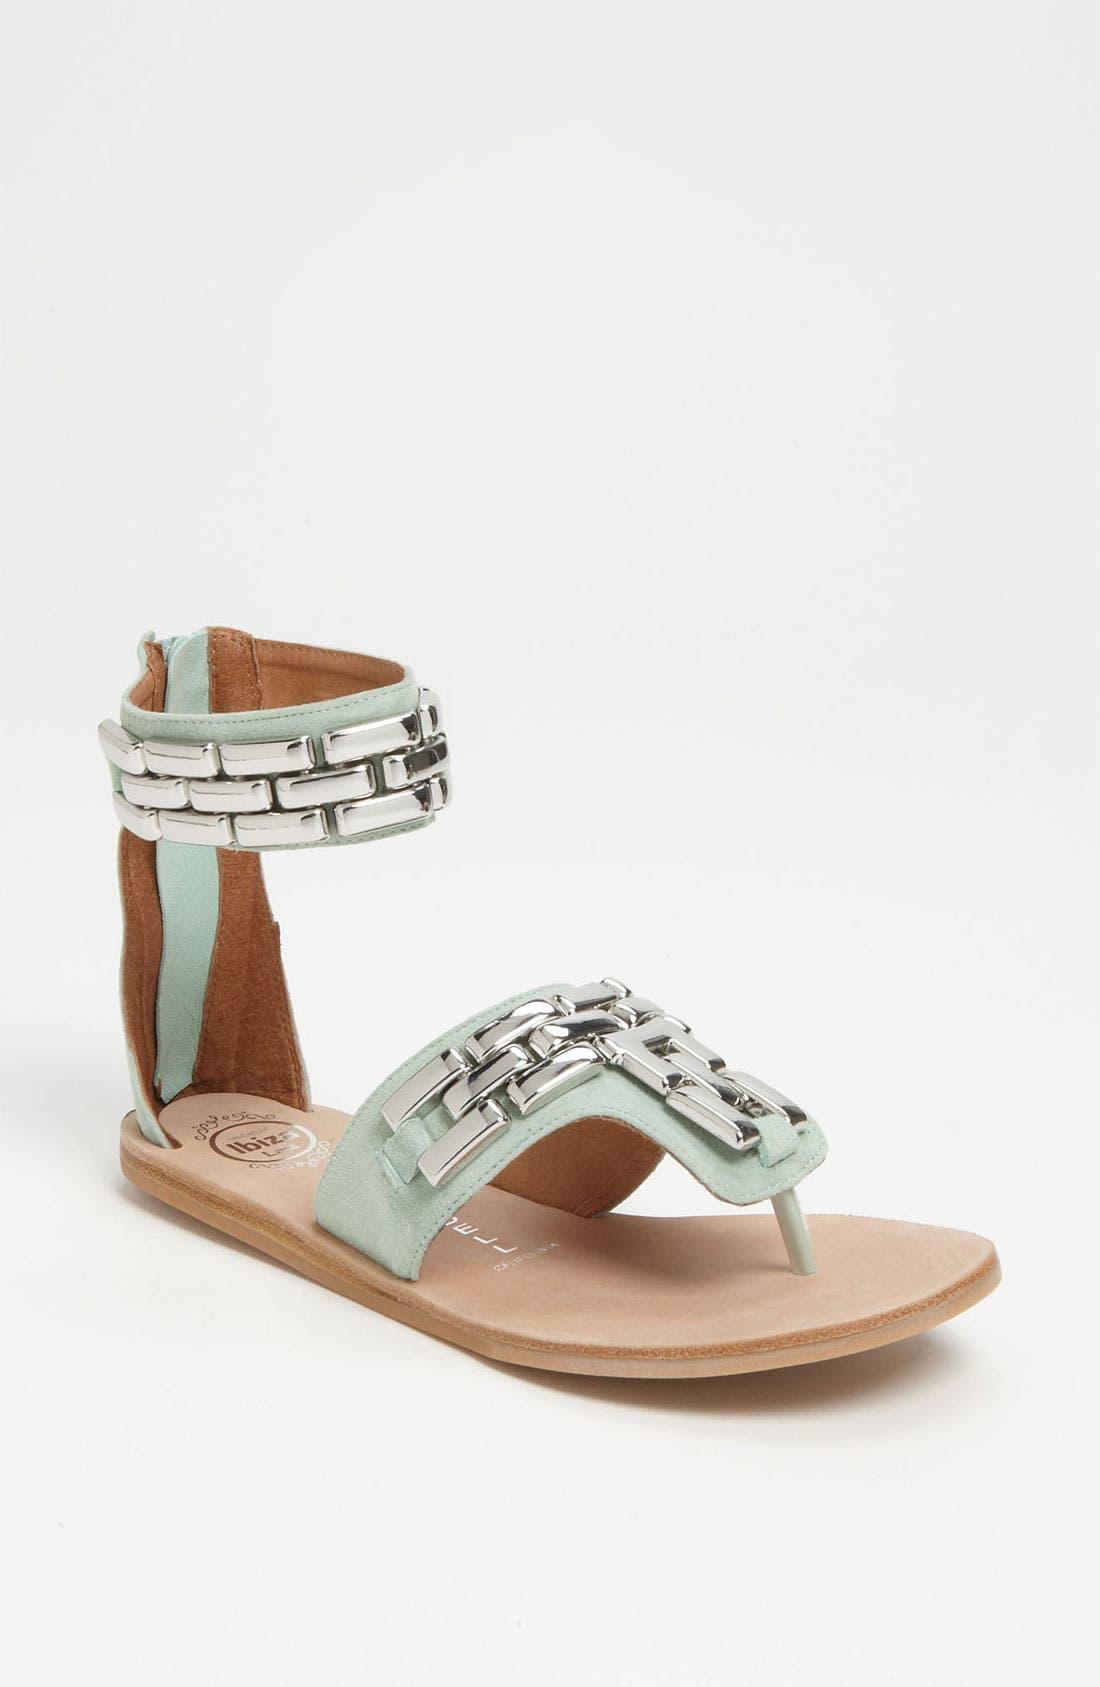 Alternate Image 1 Selected - Jeffrey Campbell 'Links' Sandal